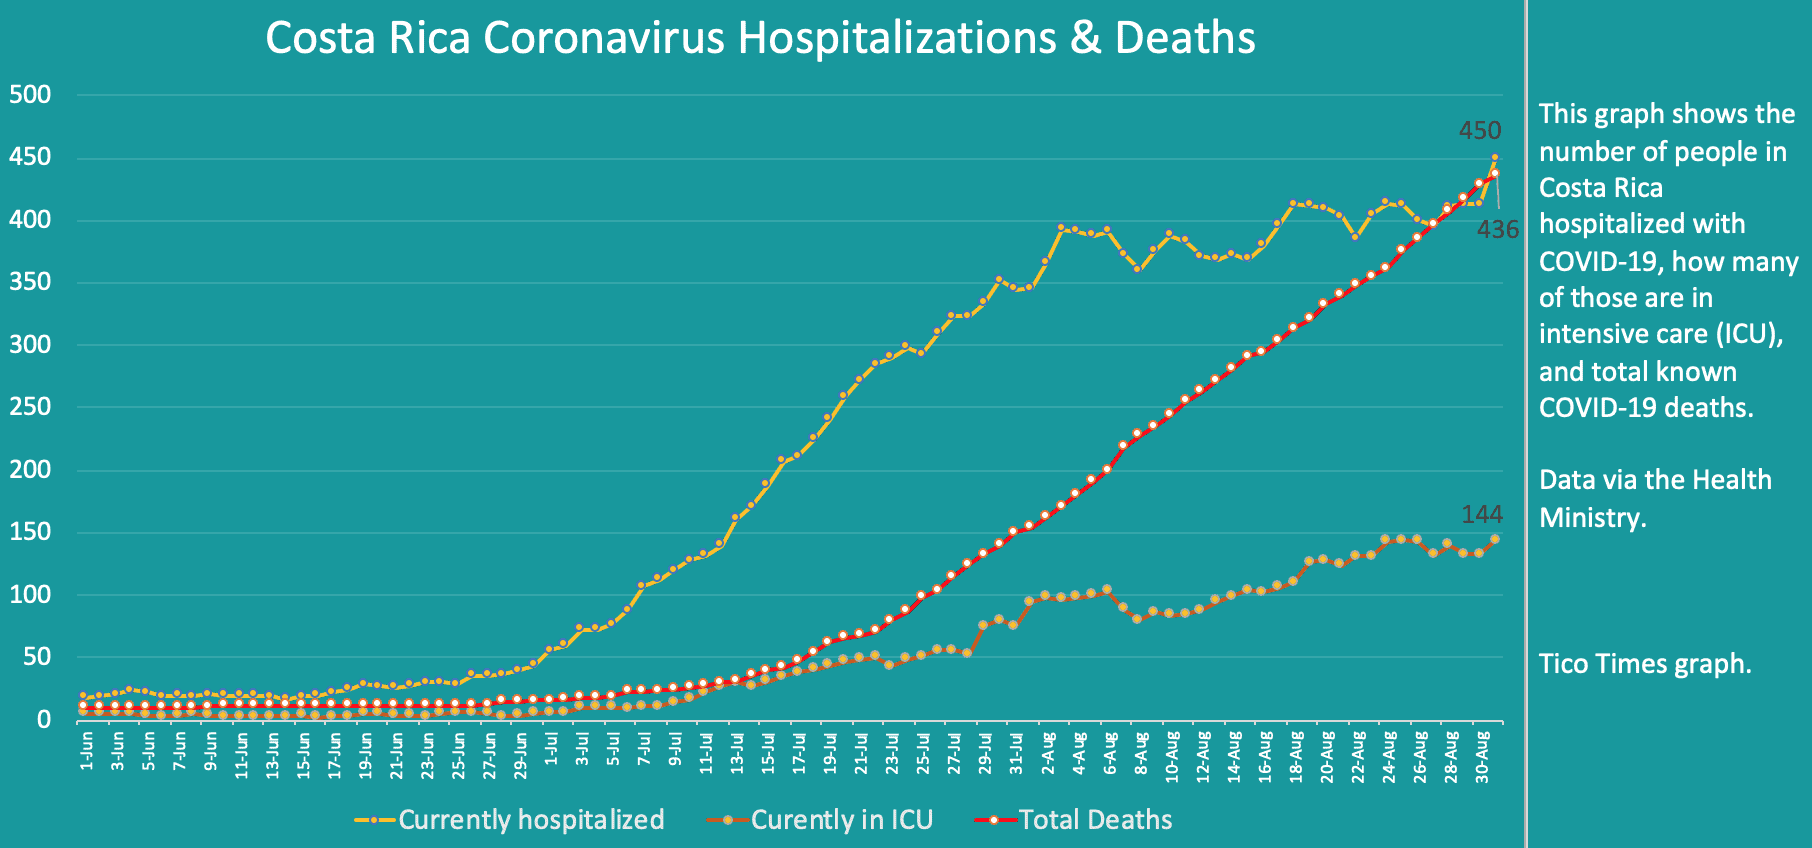 Costa Rica coronavirus hospitalizations and deaths on August 31, 2020